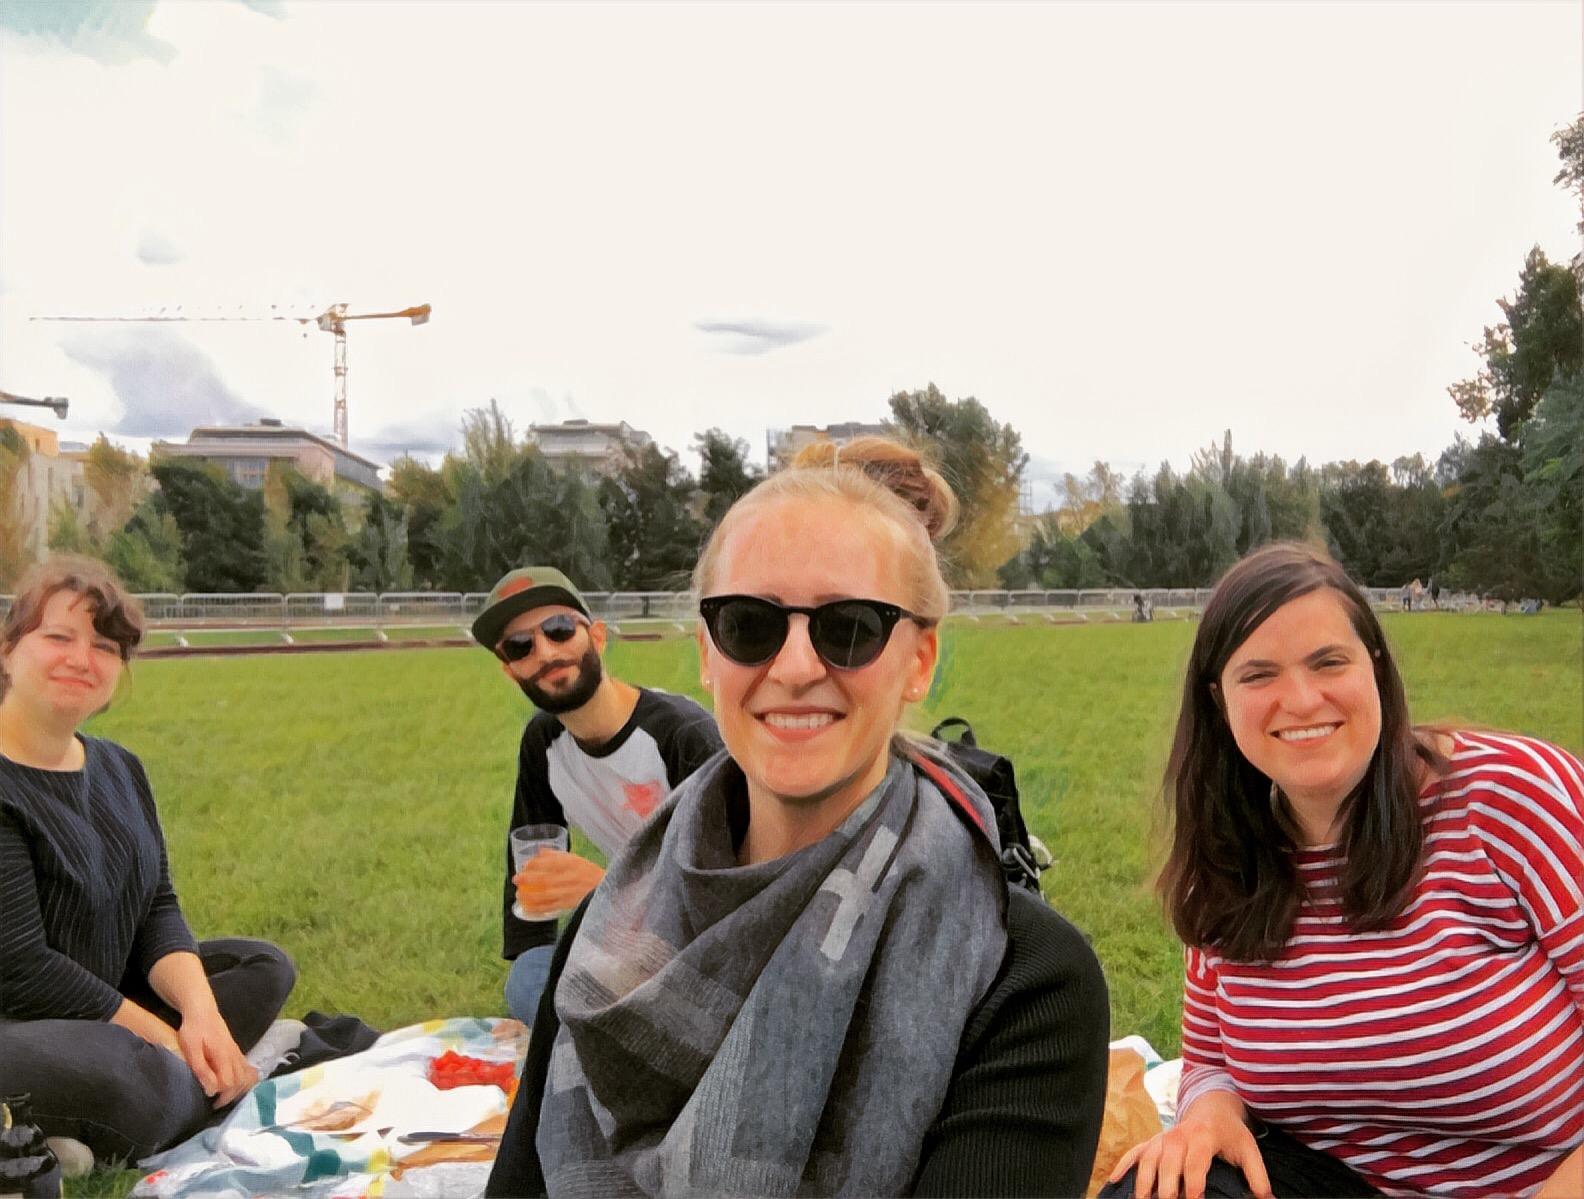 Berlin_Park-Gleisdreieck_Picnic-with-friends